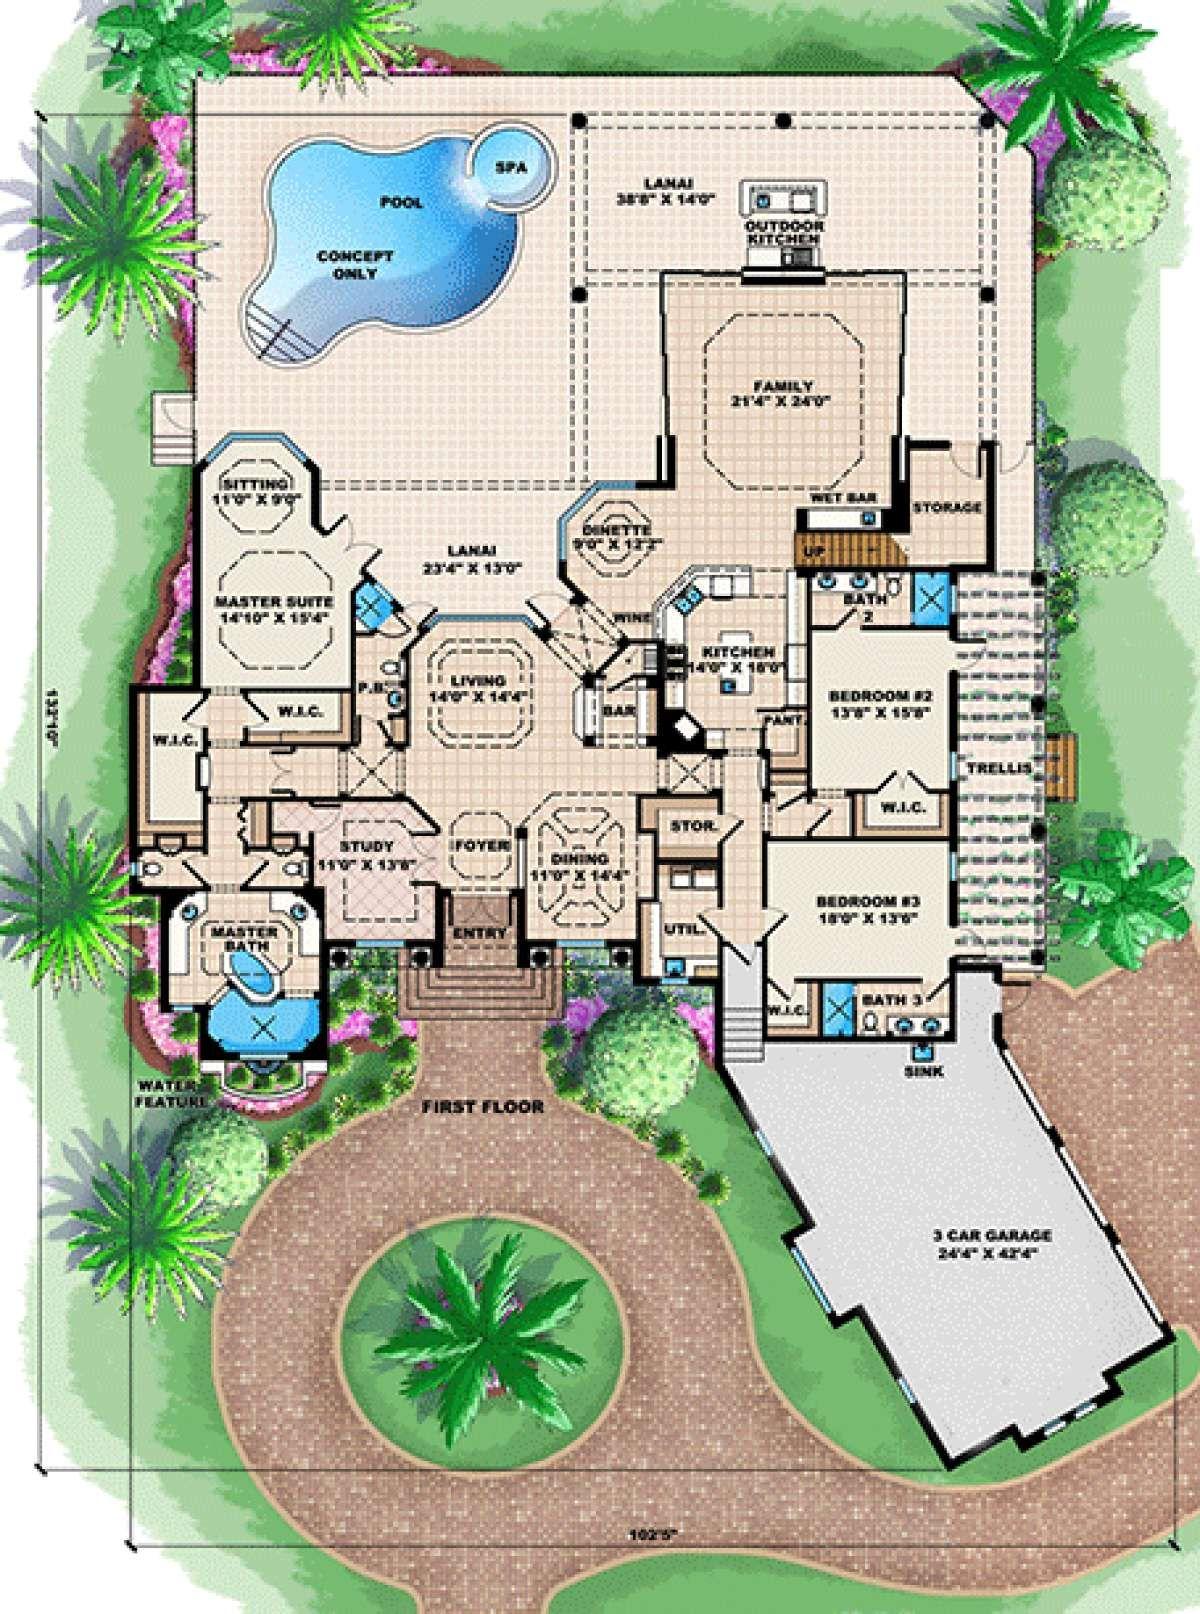 House Plan 1018 00167 Mediterranean Plan 5 087 Square Feet 4 Bedrooms 5 Bathrooms Tuscan House Plans Tuscan House Luxury House Plans